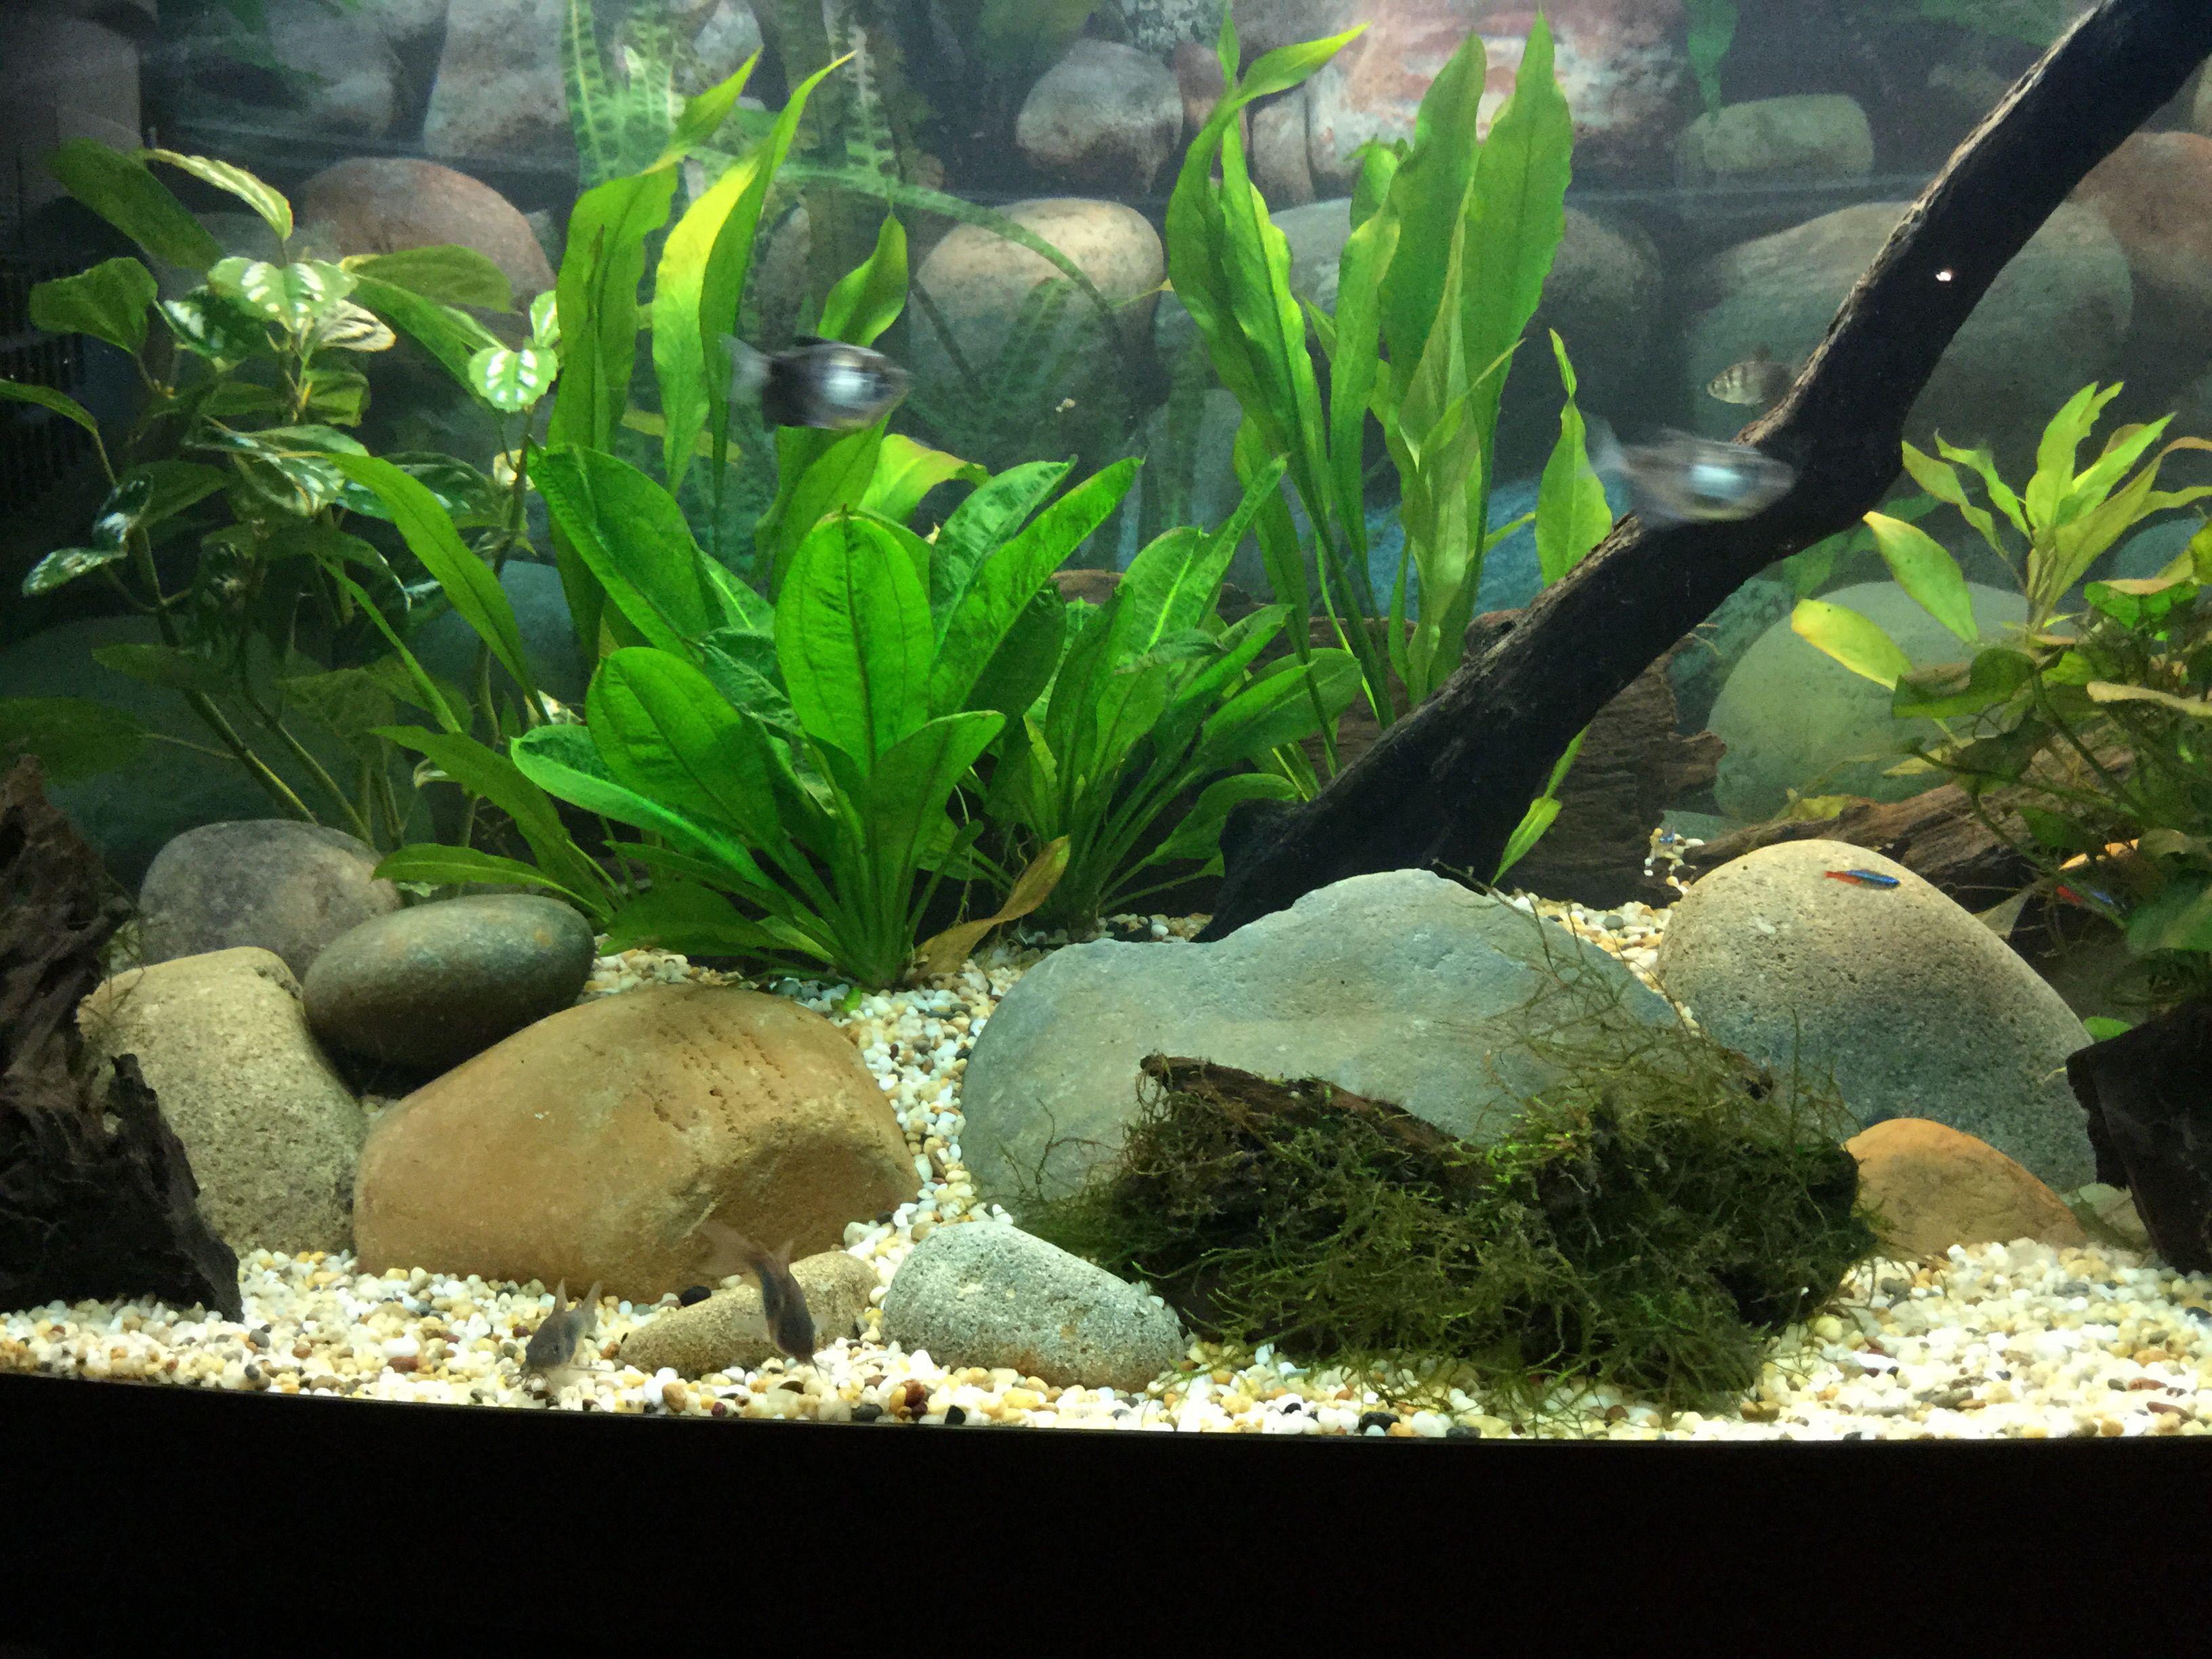 503 Service Unavailable Aquascape River Rock Plants